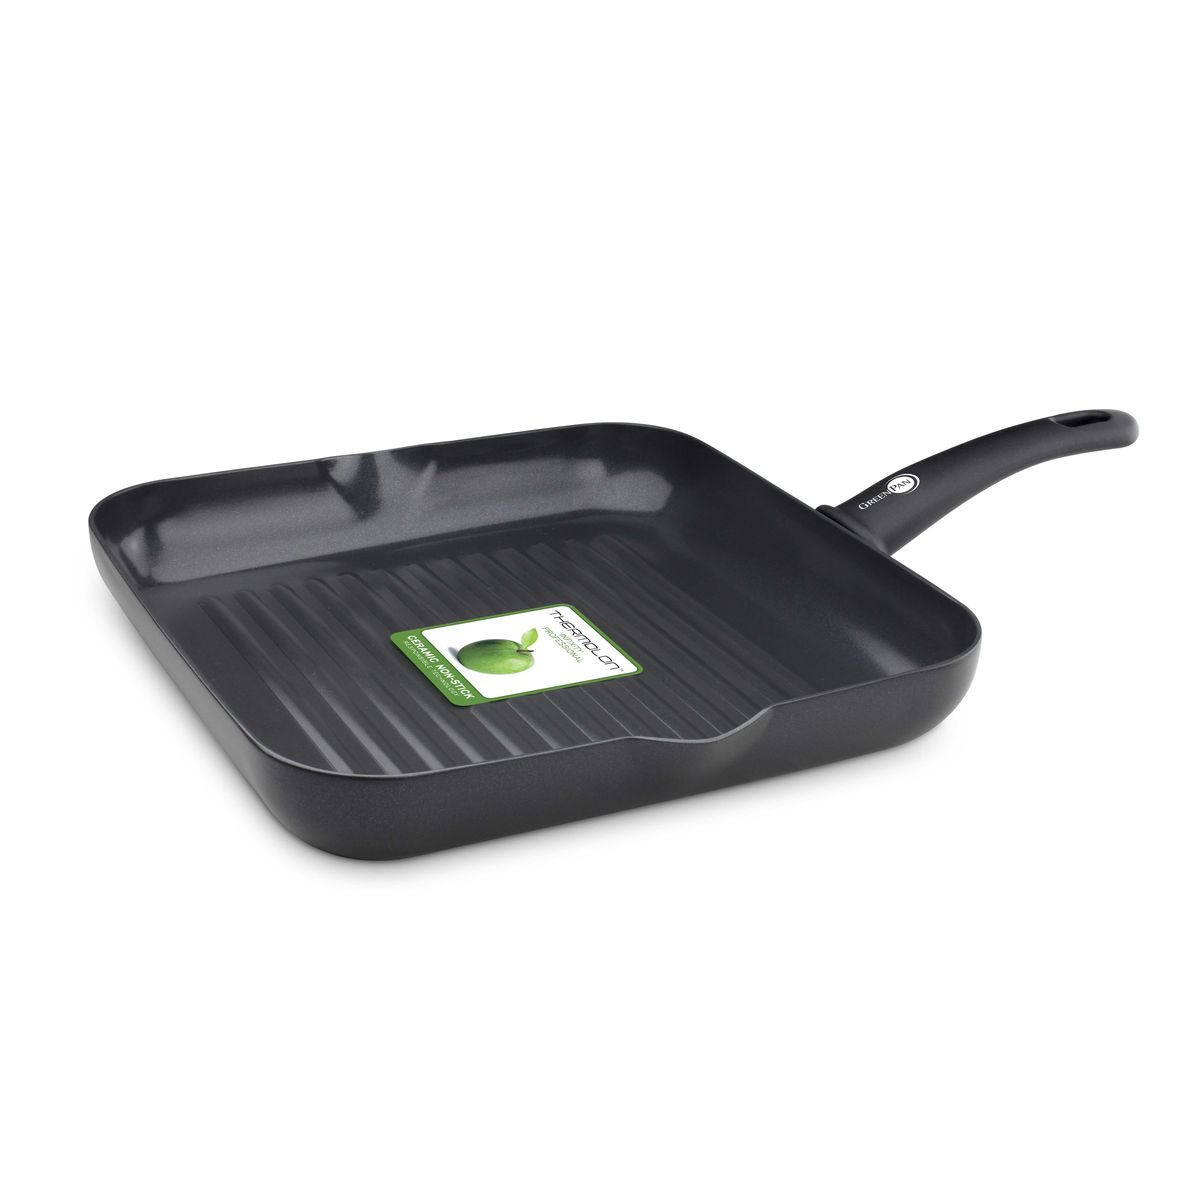 Cw002356 002 Infinity Ceramic Non Stick Square Grill Pan